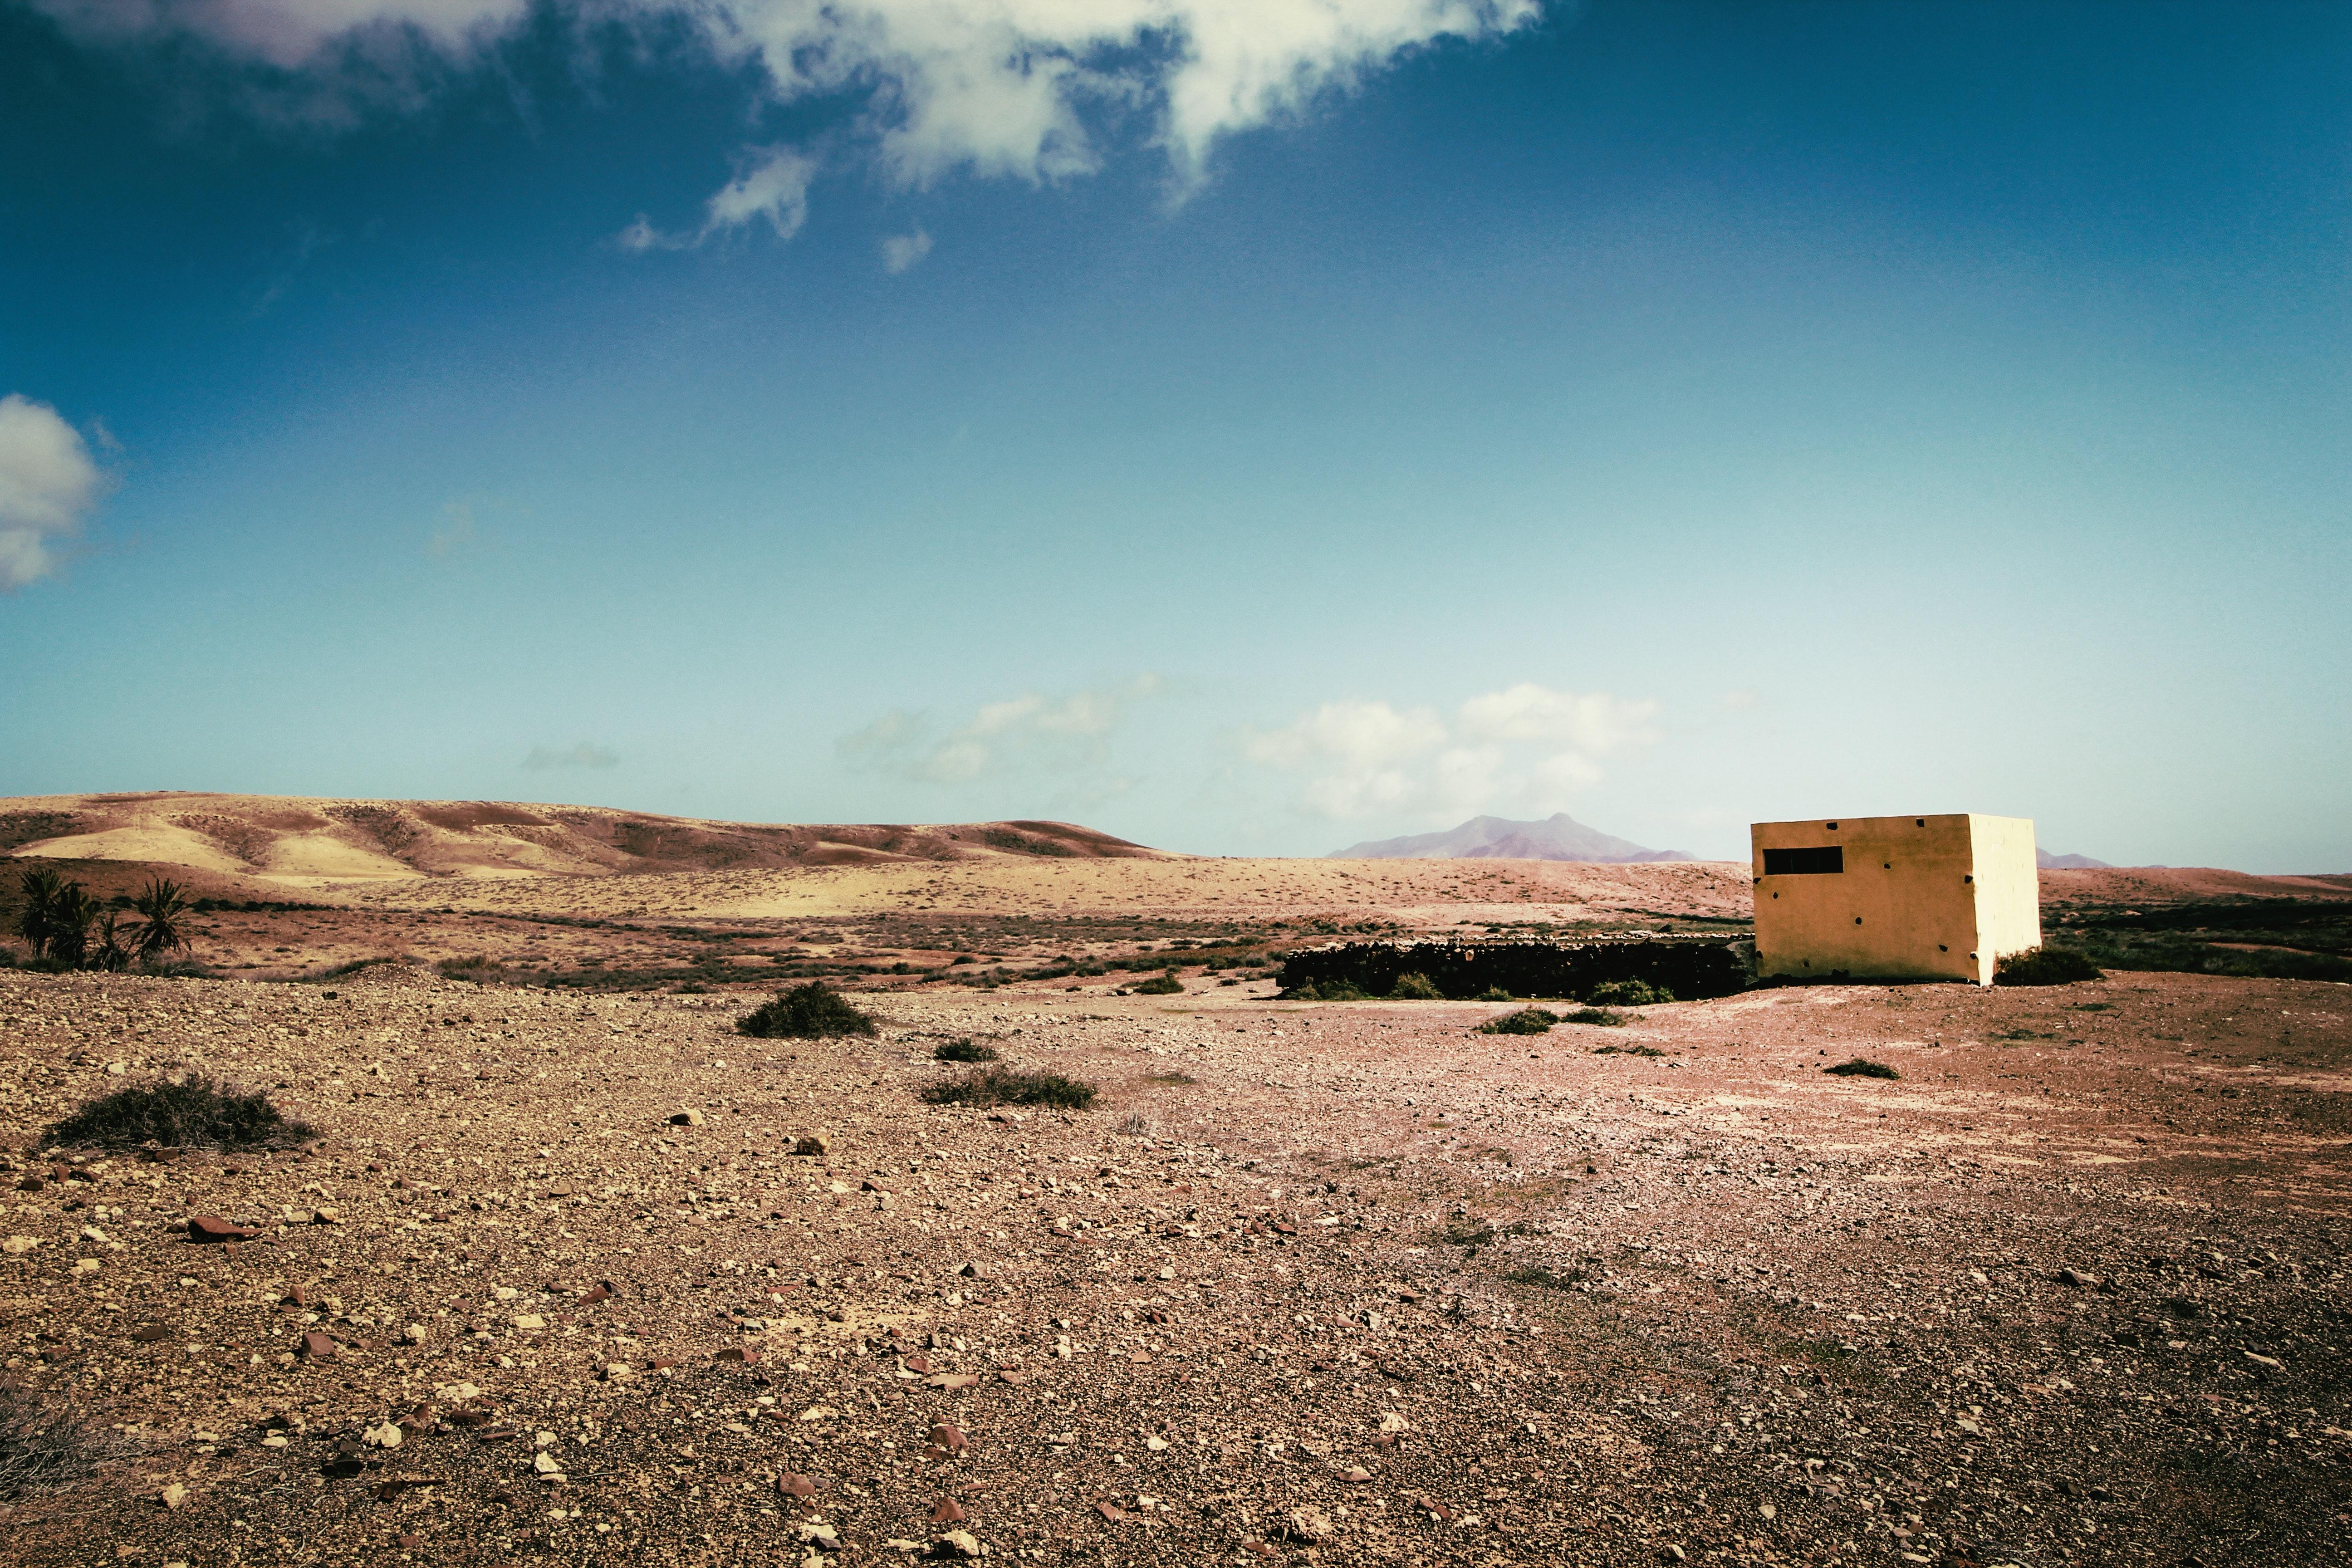 White concrete building on desert photo